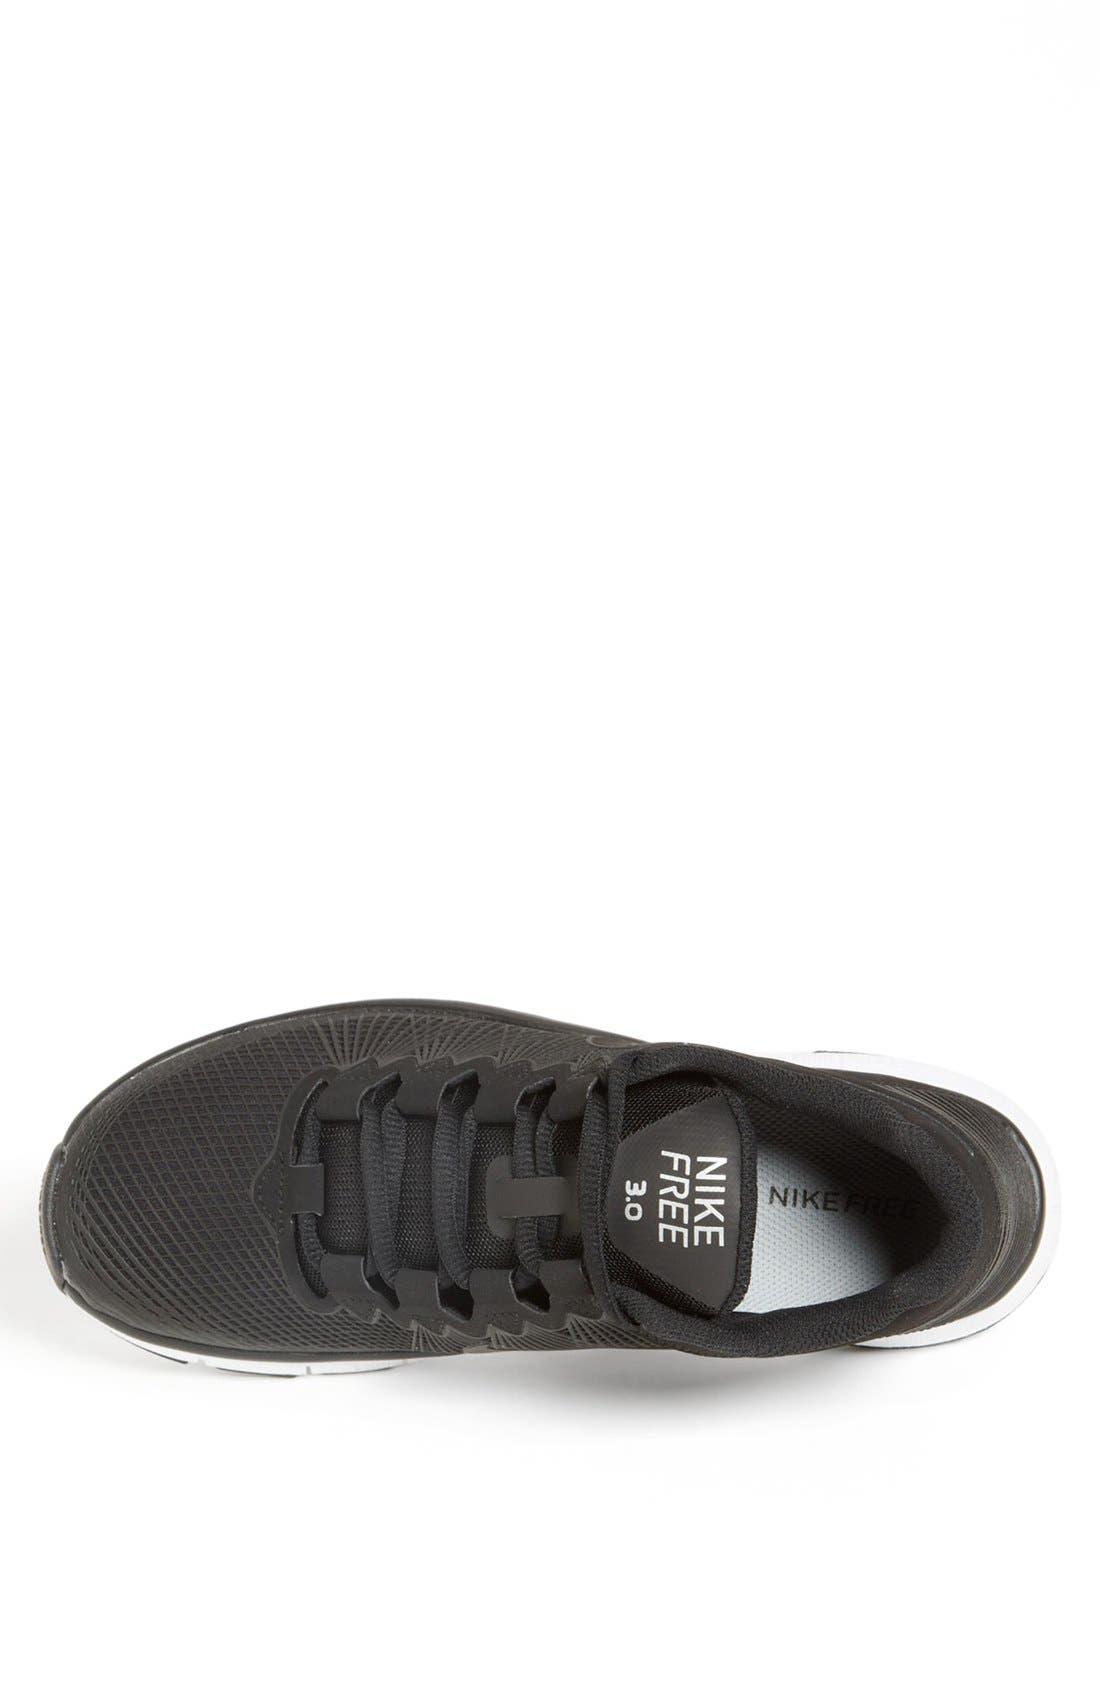 Alternate Image 3  - Nike 'Free Trainer 3.0' Training Shoe (Men)